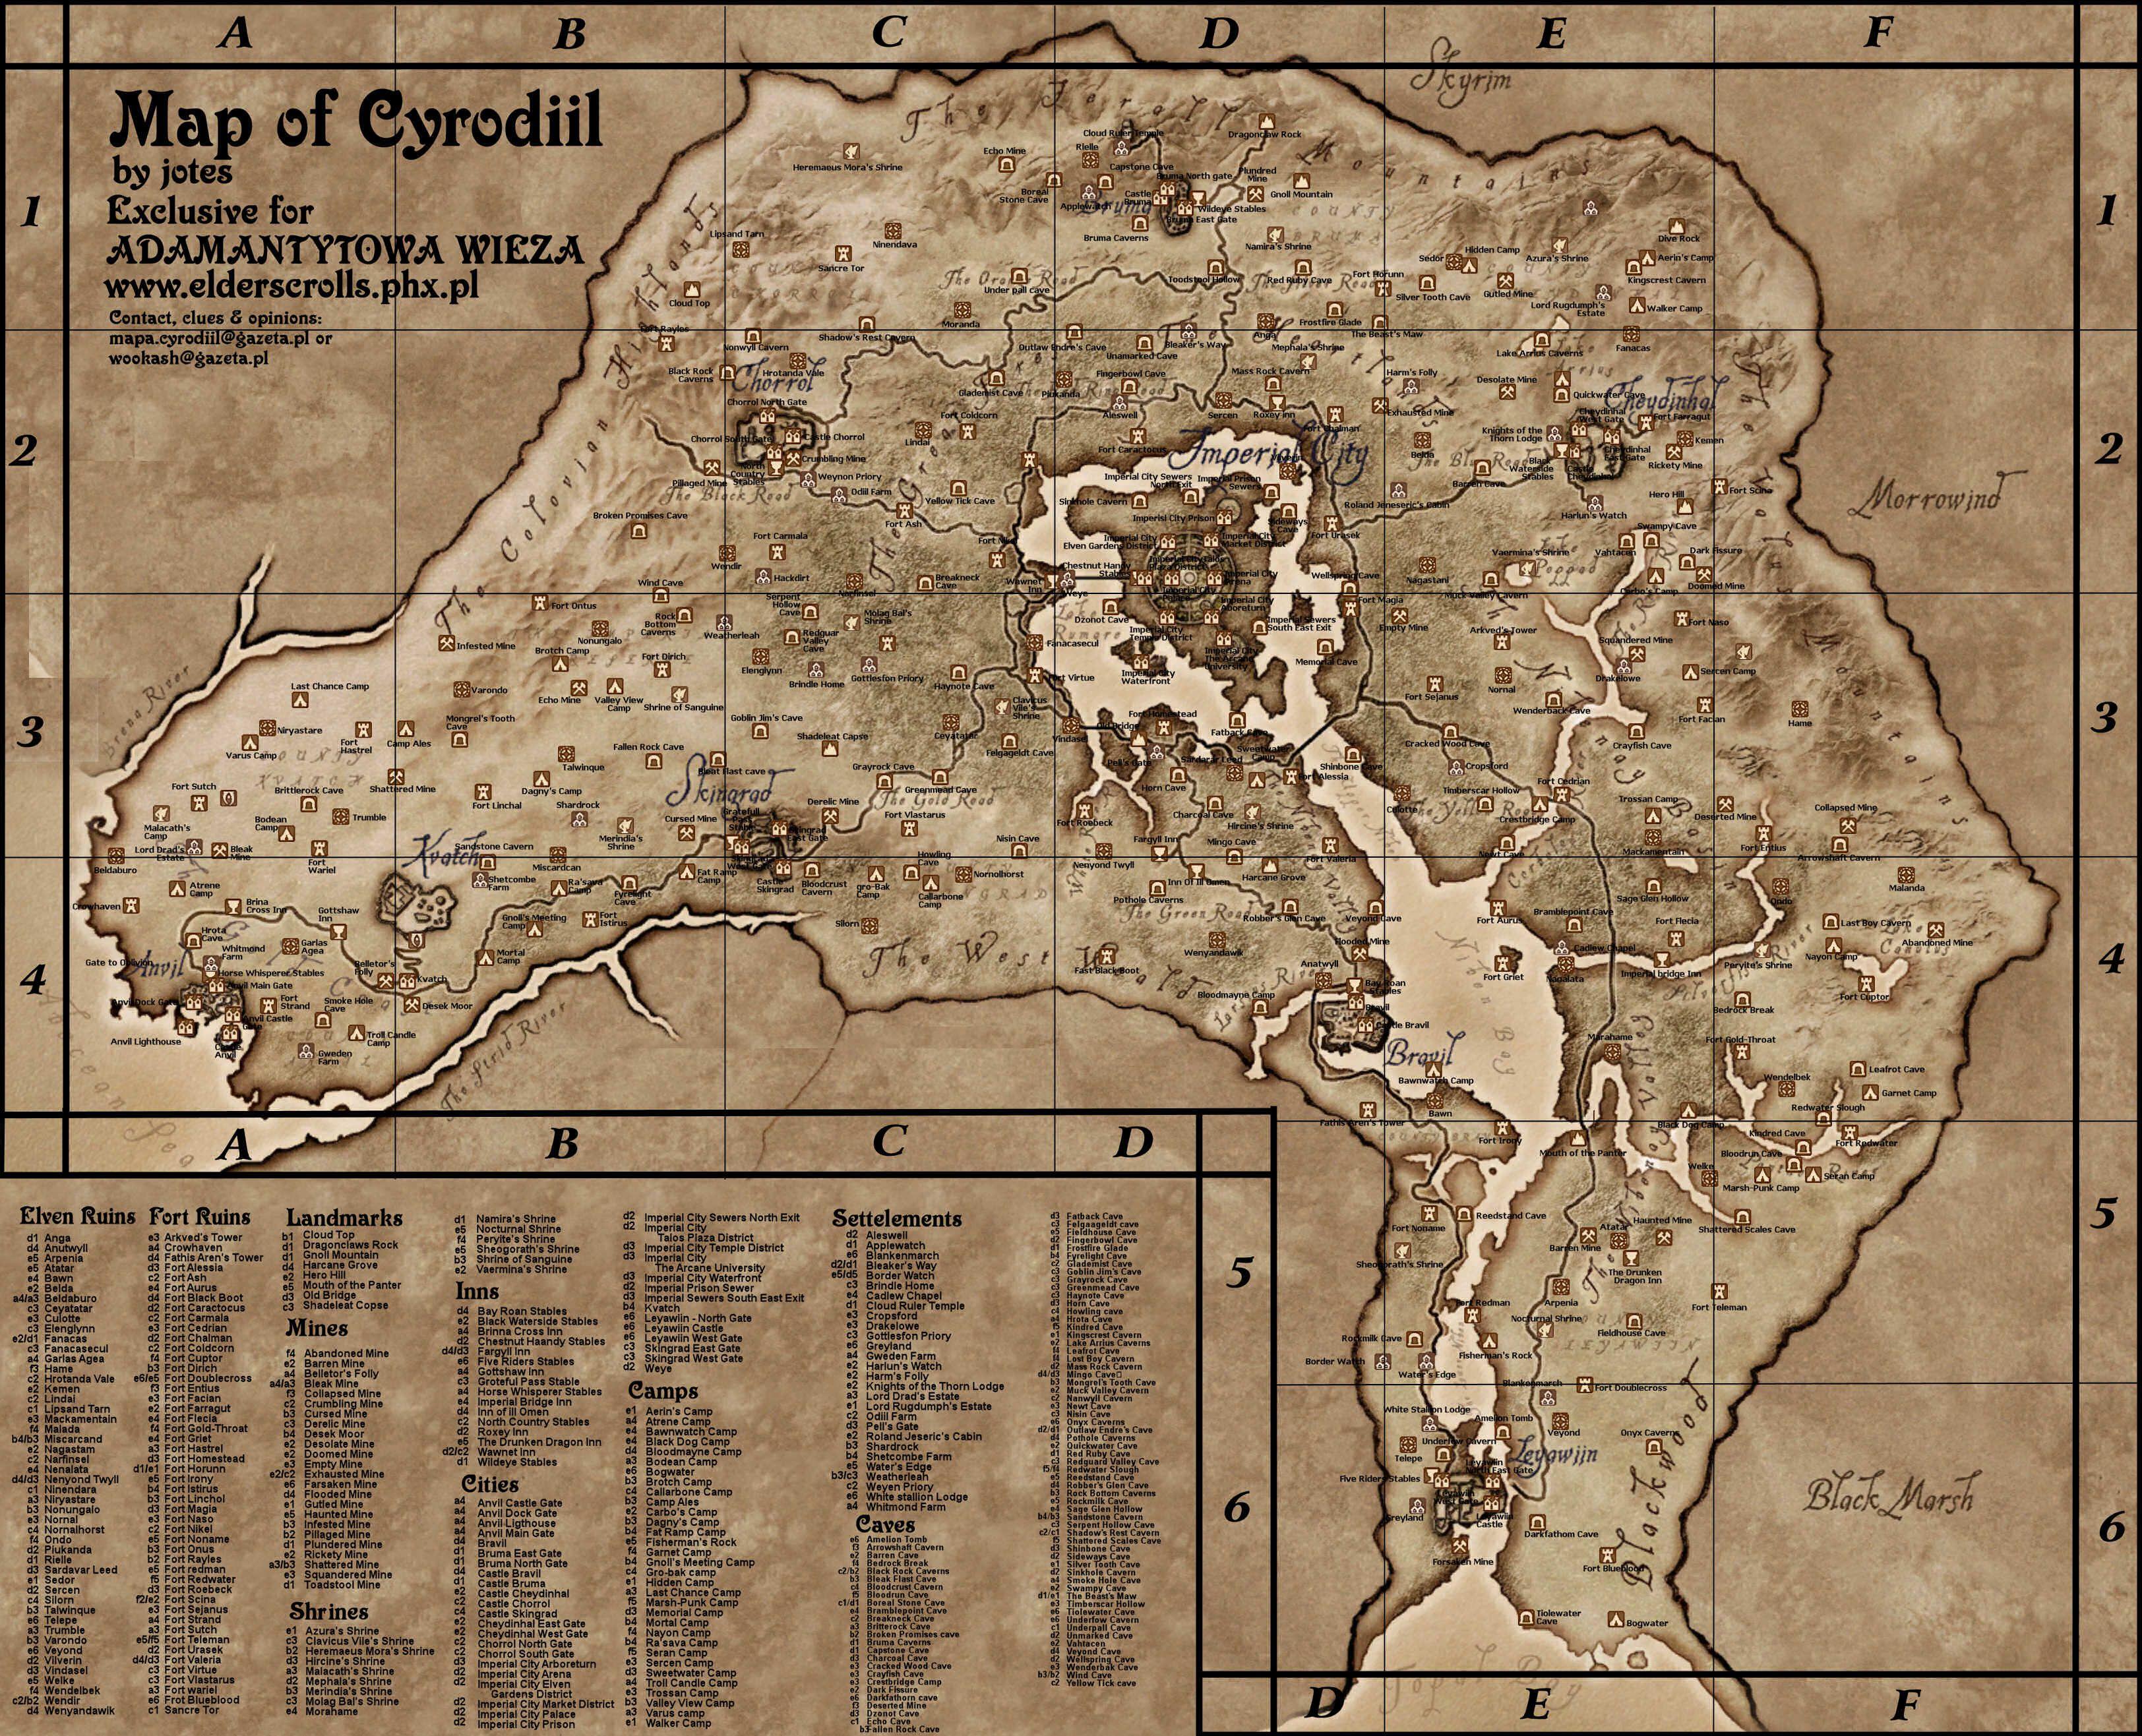 Oblivion Karte.Map Of Cyrodiil By Jotes Nerdy Maps Map Elder Scrolls Vintage